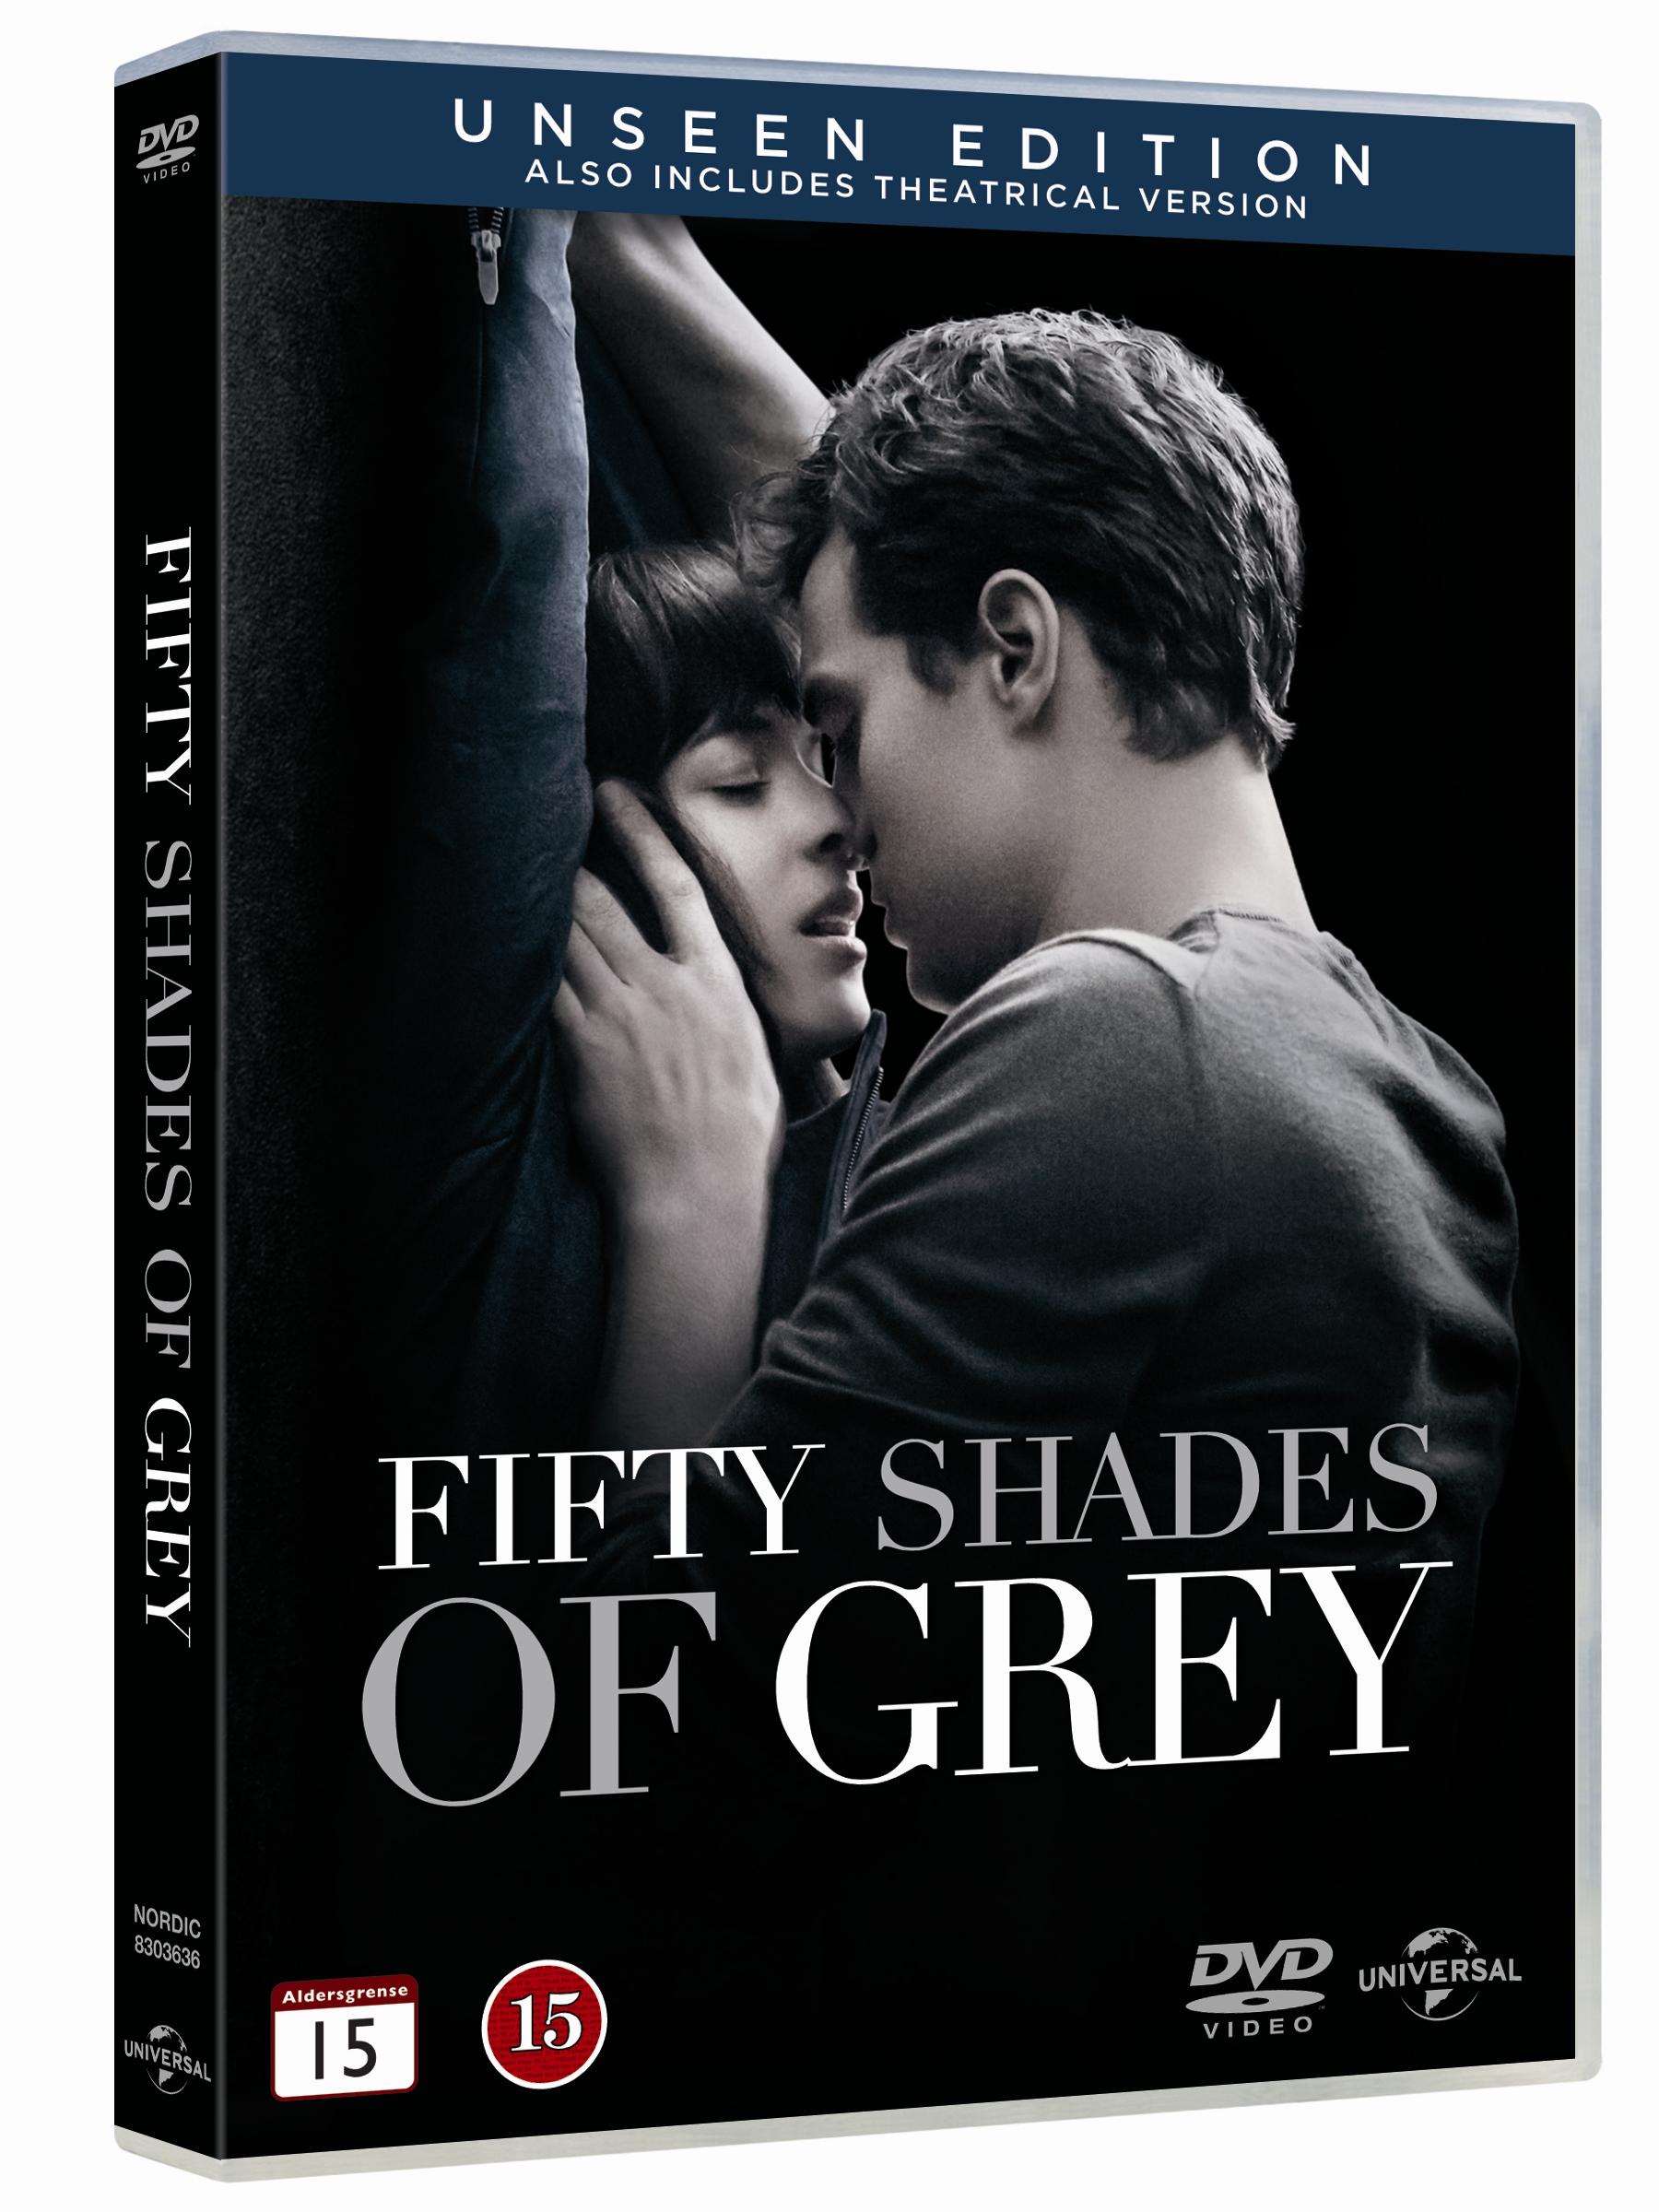 Fifty Shades of Grey - Jamie Dornan - Film - Universal - 5053083036362 - June 15, 2015